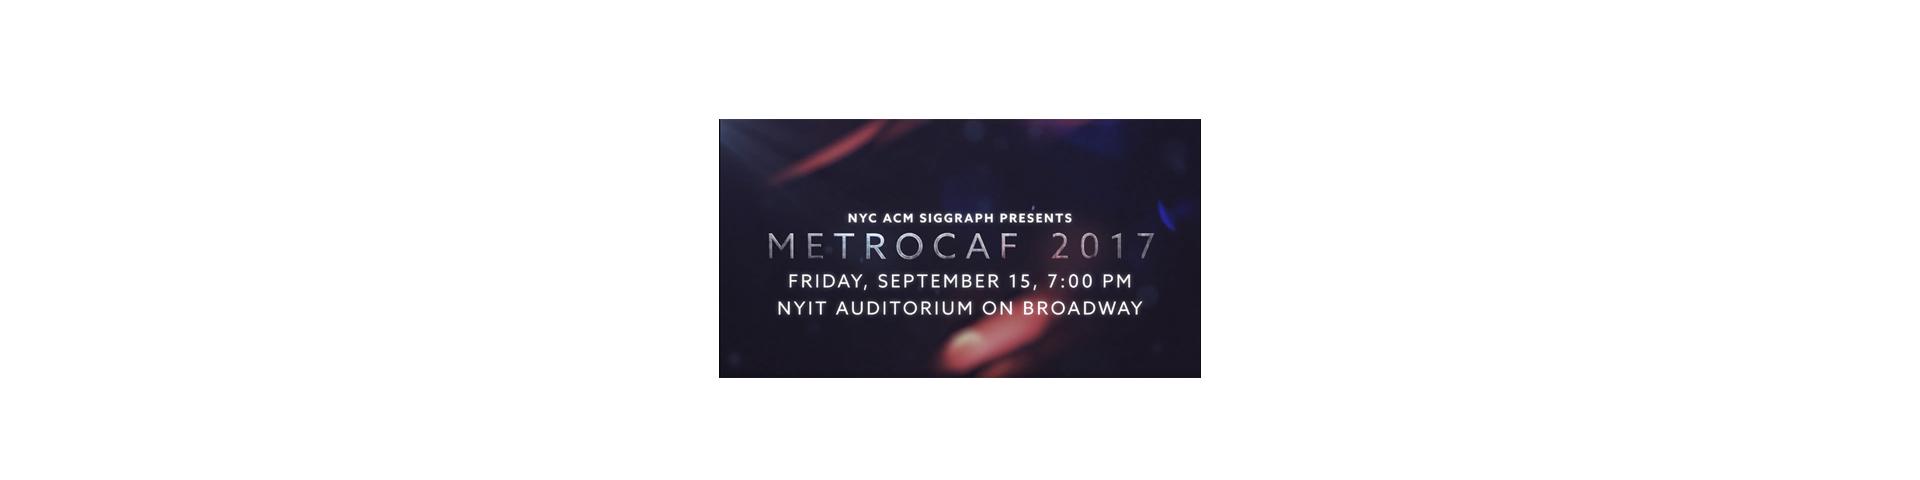 SIGGRAPH MetroCAF2017